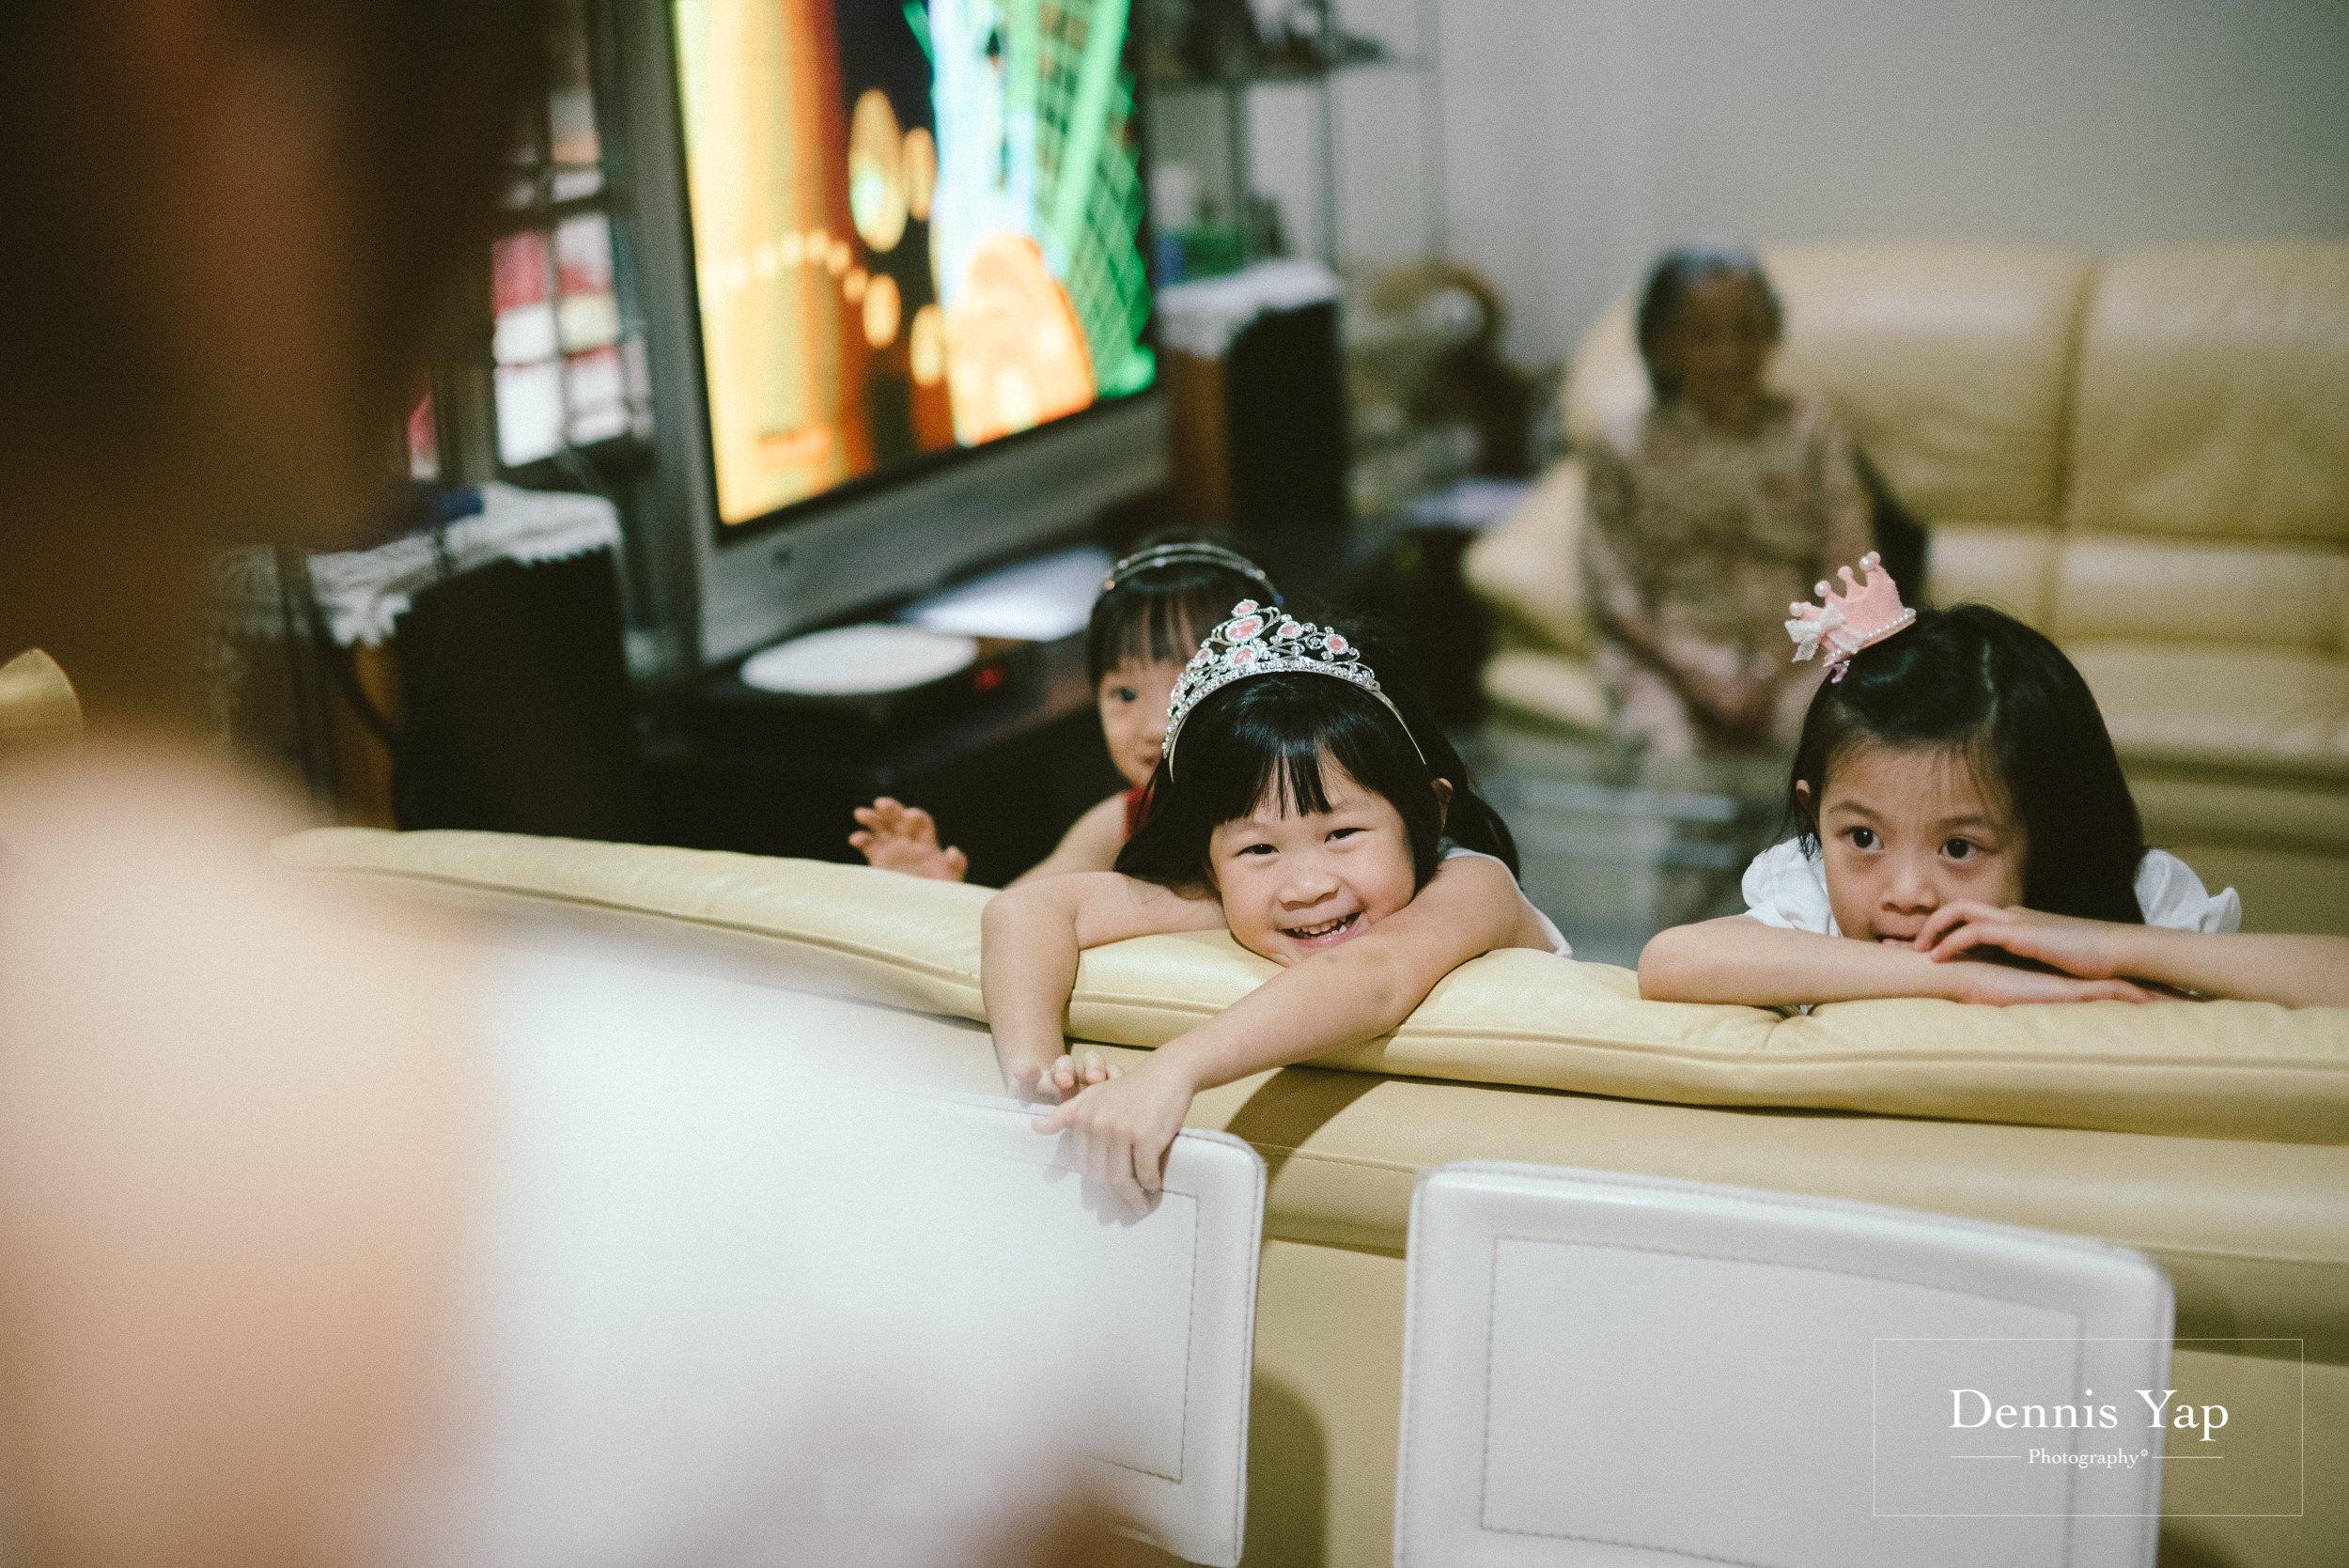 chuan wai angela wedding day bukit jelutong selangor malaysia dennis yap photography-6.jpg